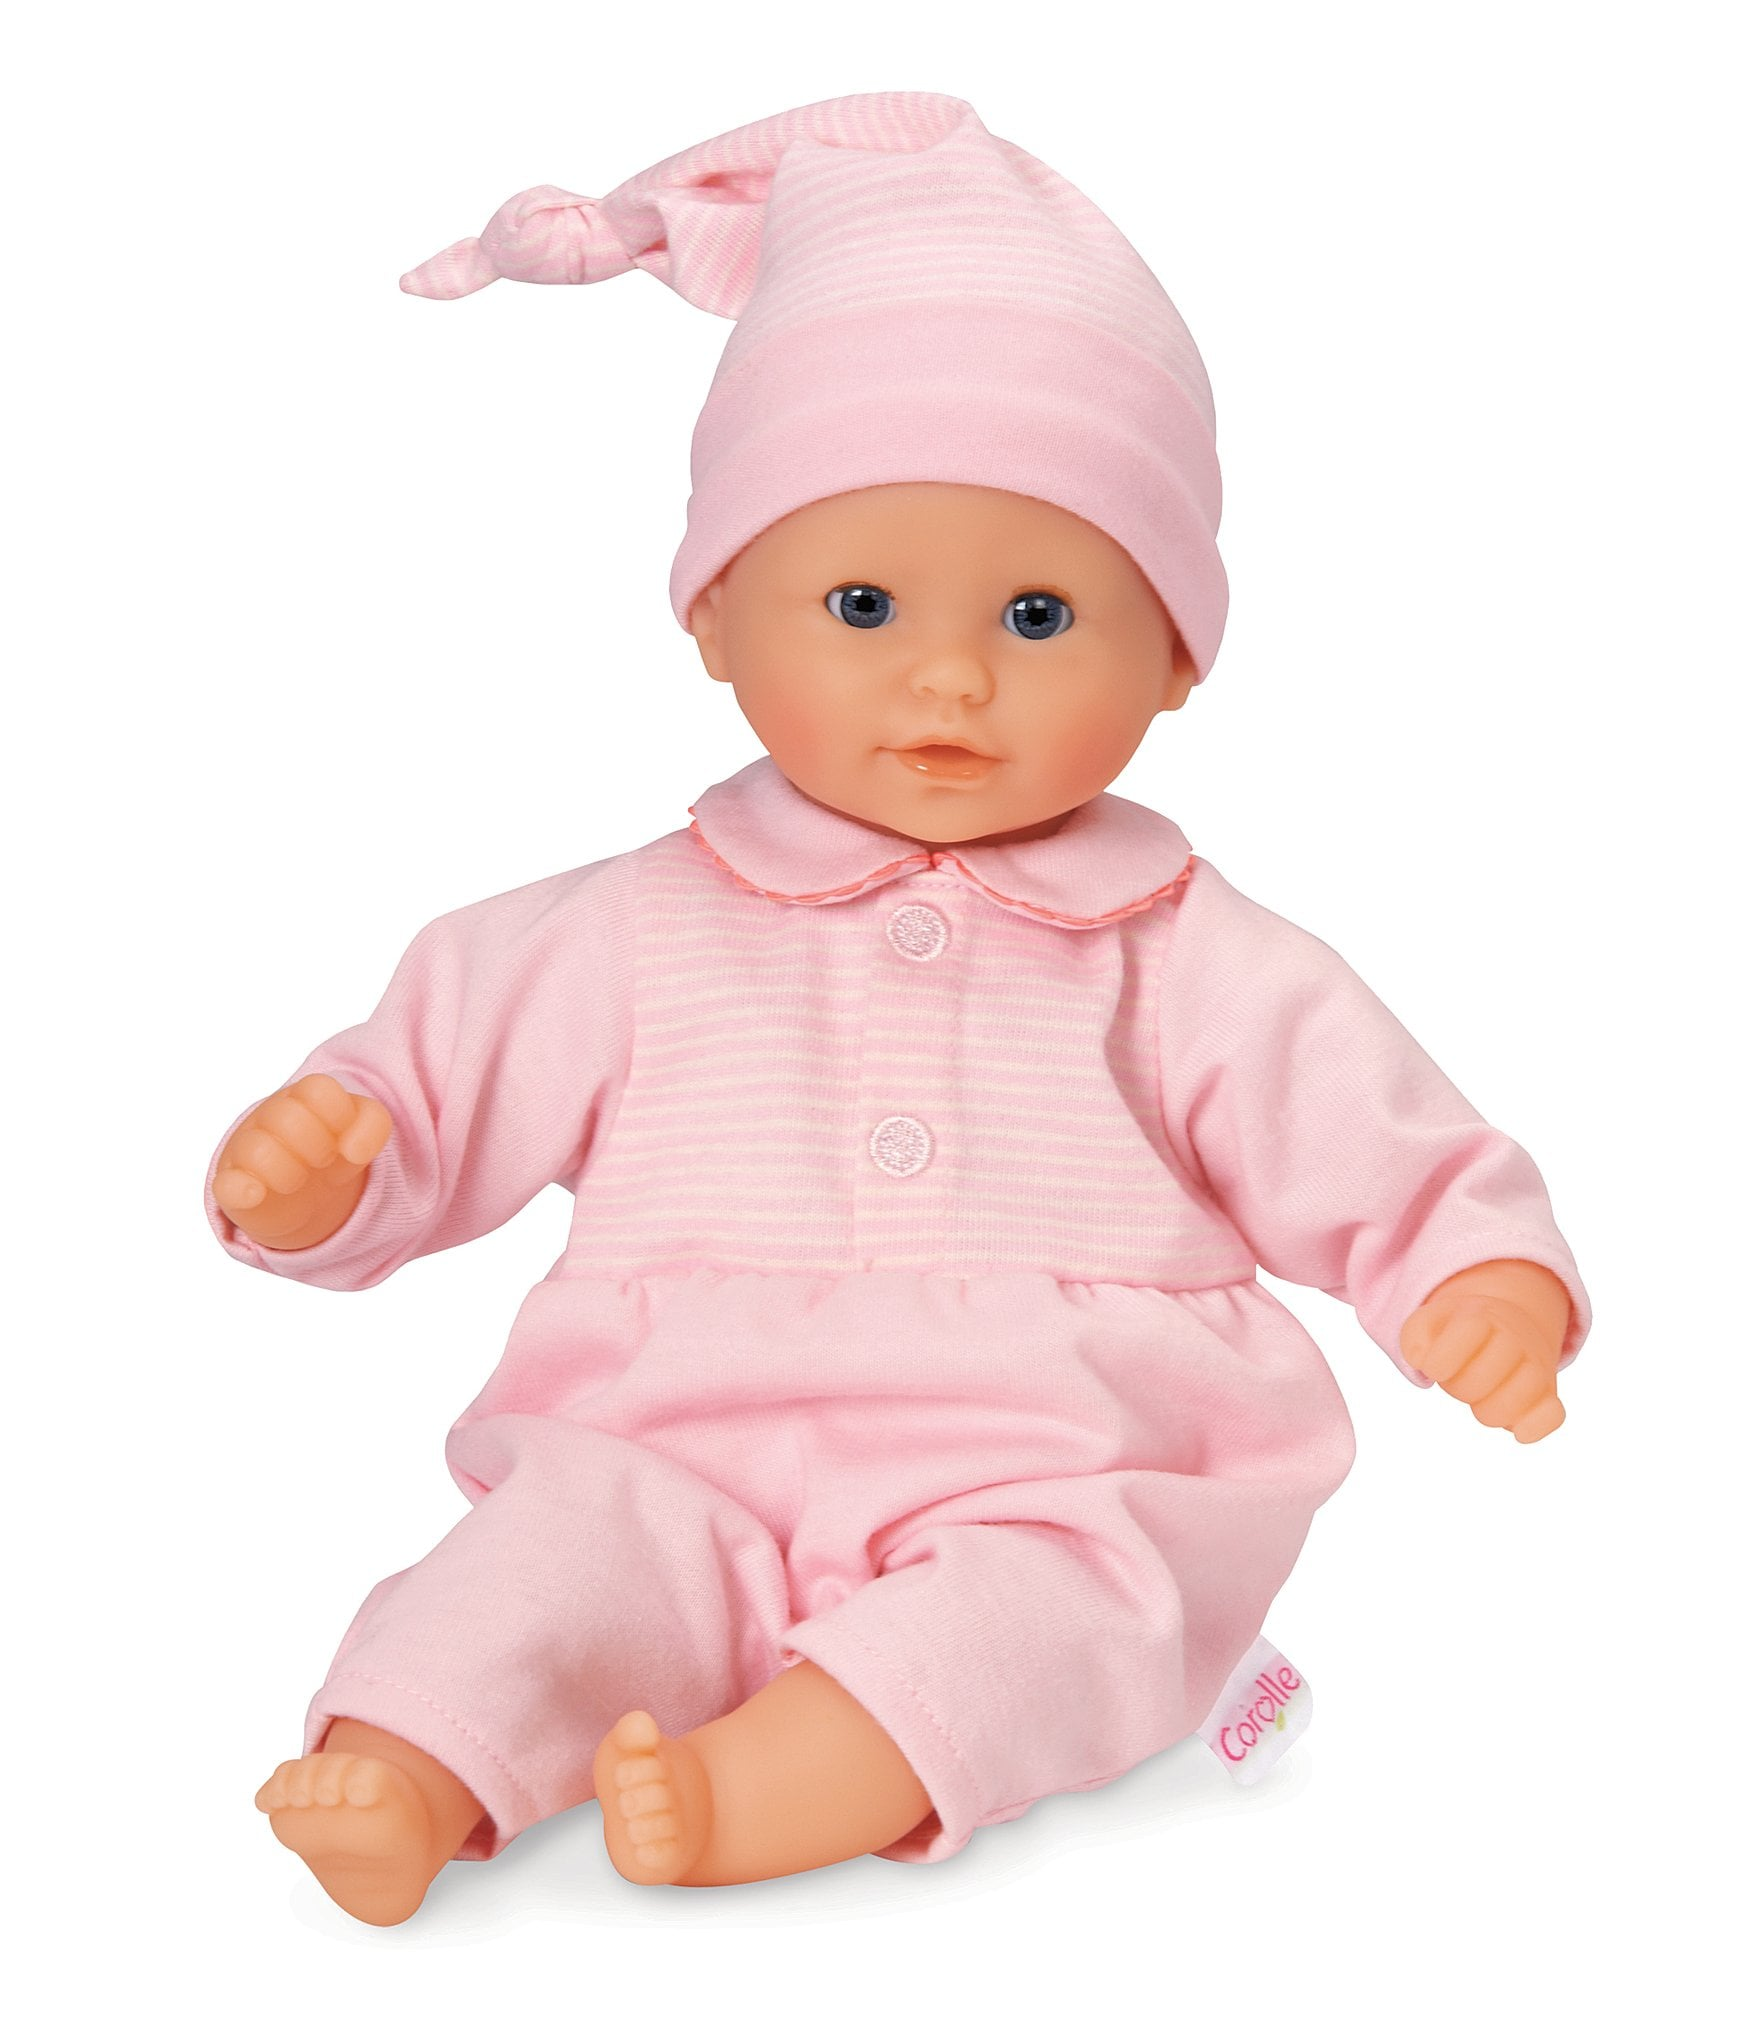 corolle dolls bebe calin charming pastel baby doll dillard 39 s. Black Bedroom Furniture Sets. Home Design Ideas